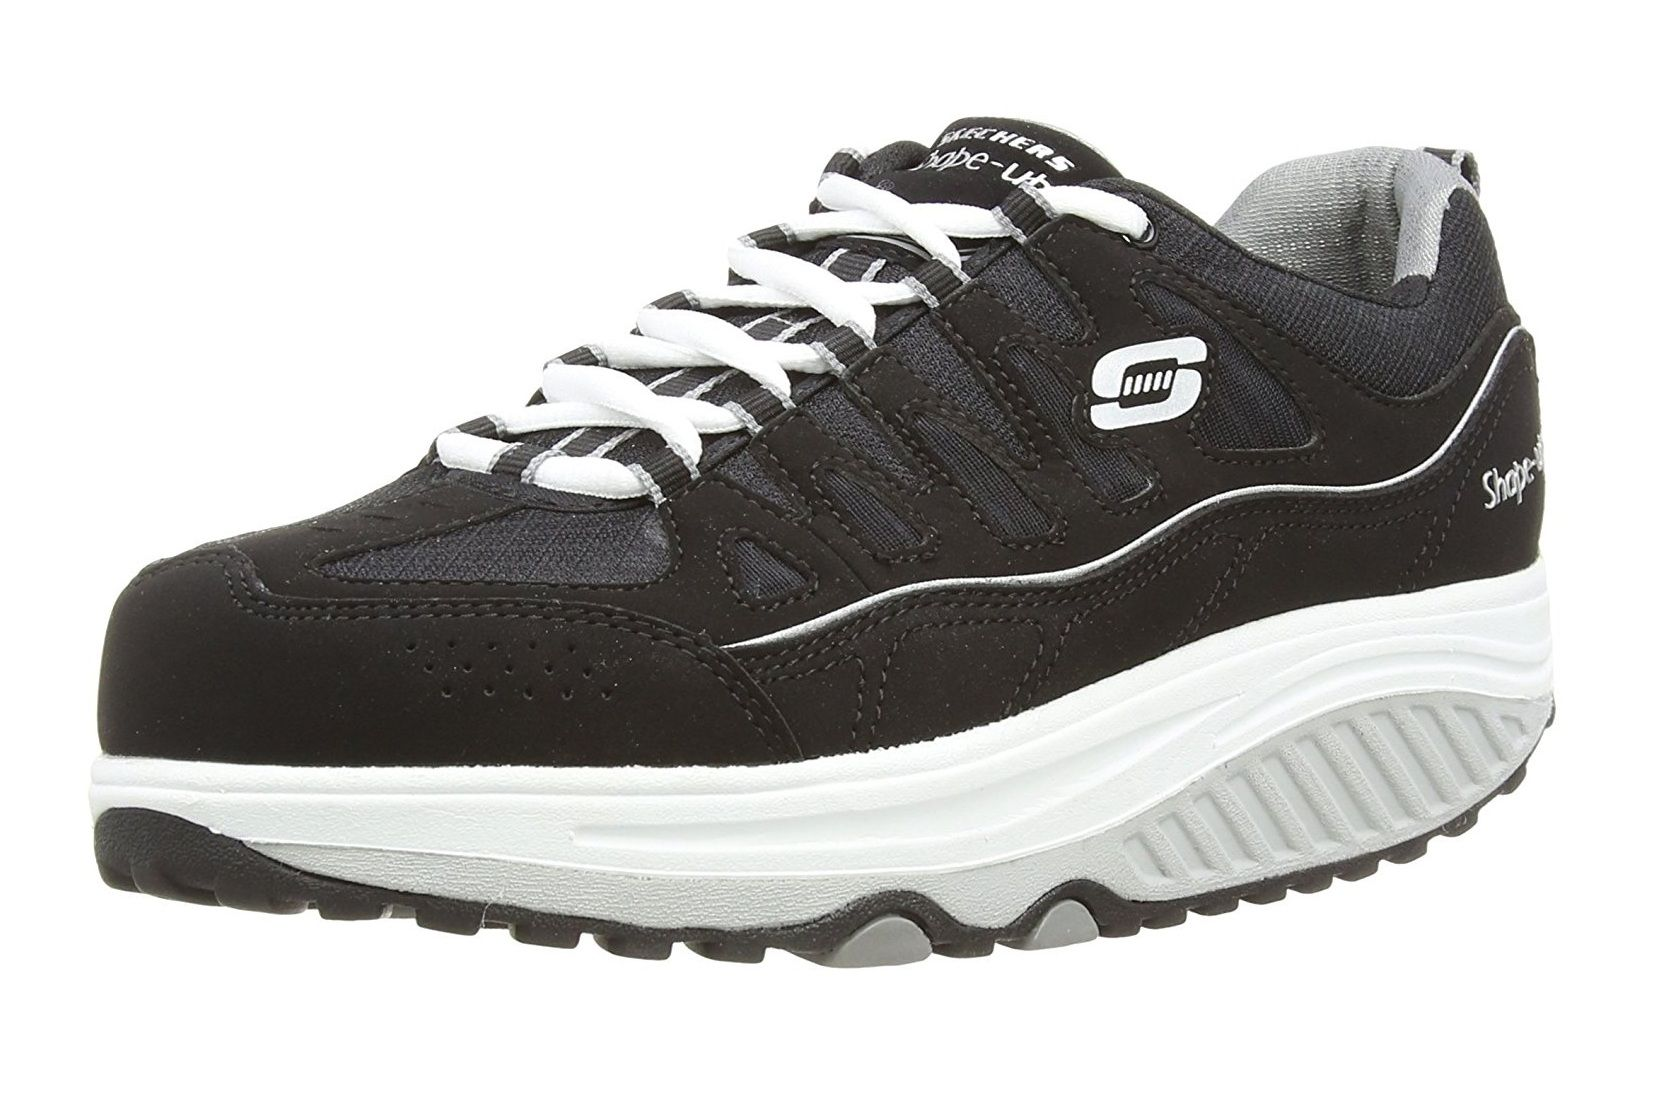 fd7e03b6ed1 Skechers Shape-Ups Walking Shoes Review